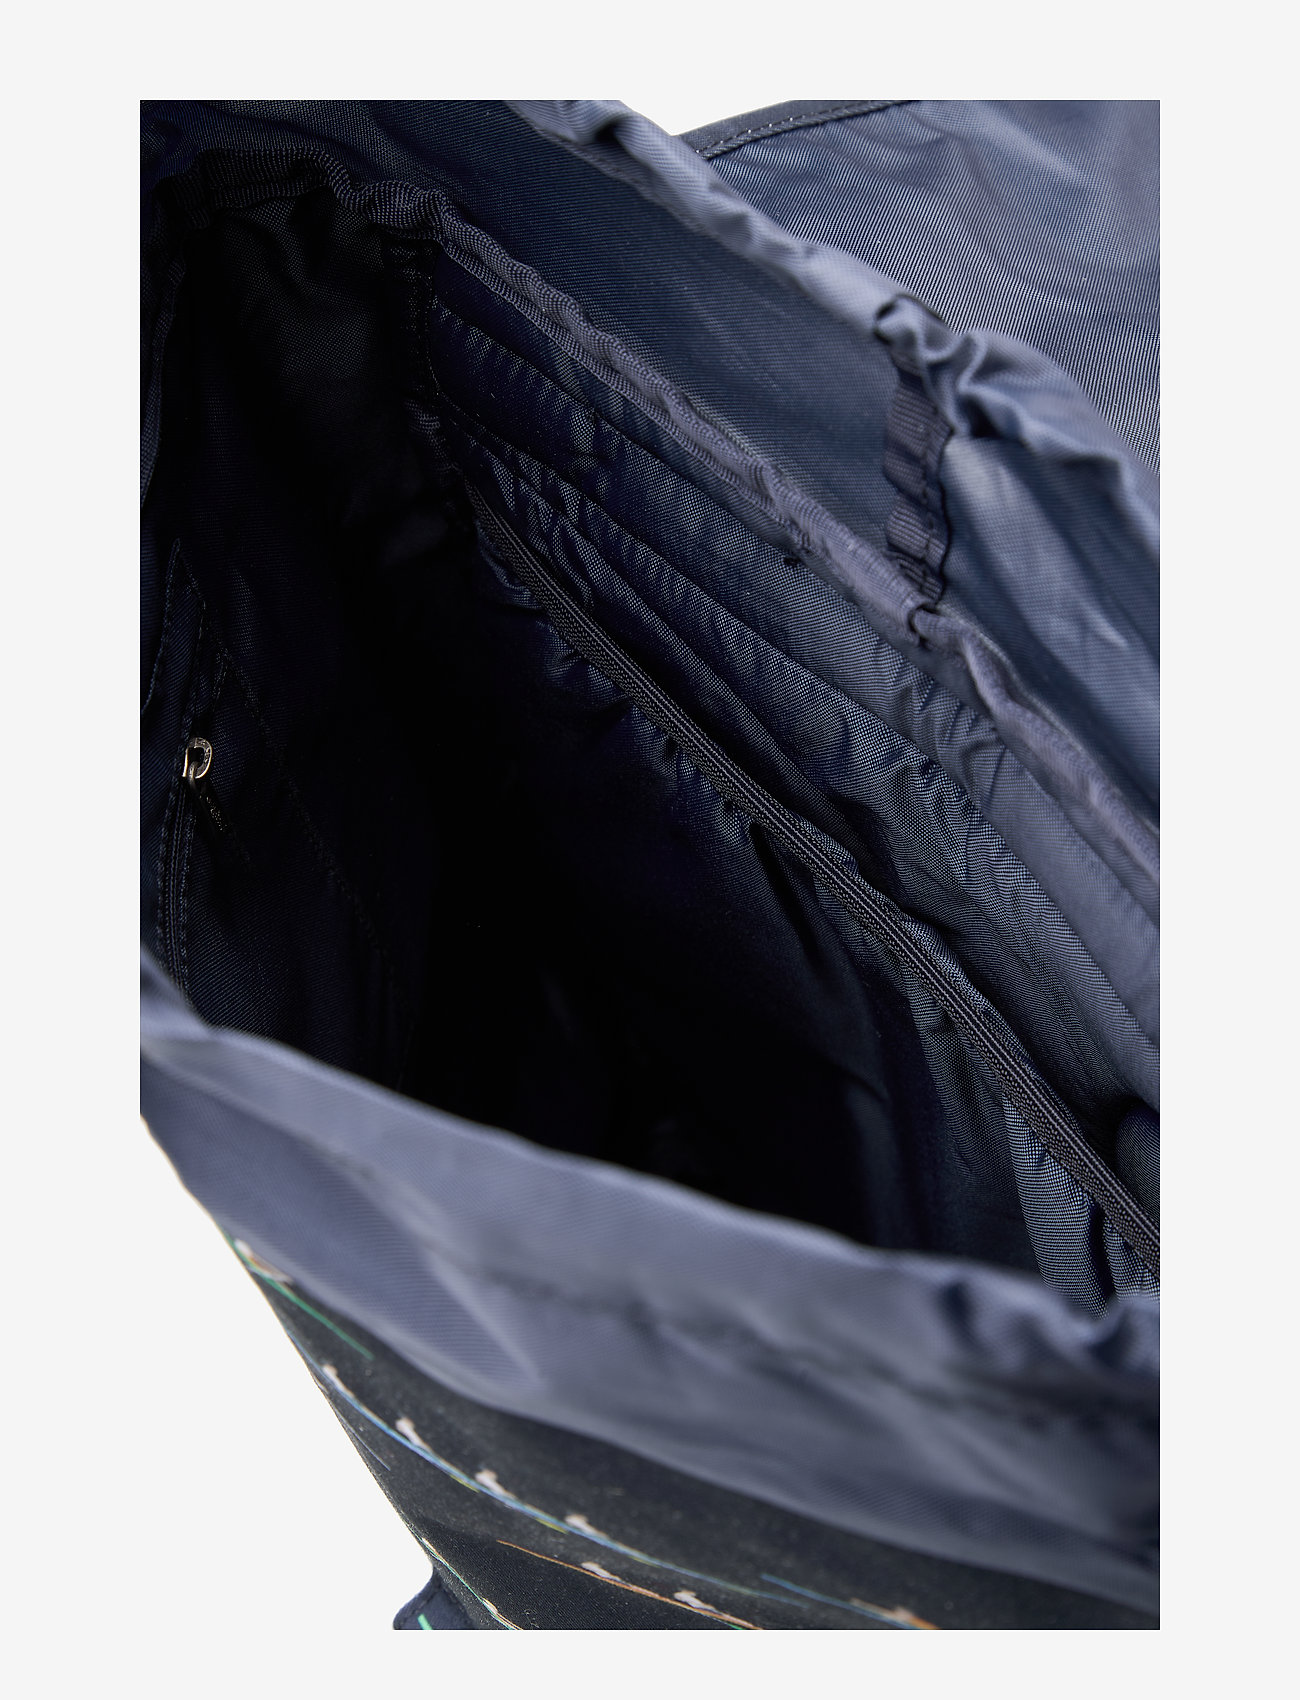 Eastpak CIERA - Plecaki ROWER - Torby